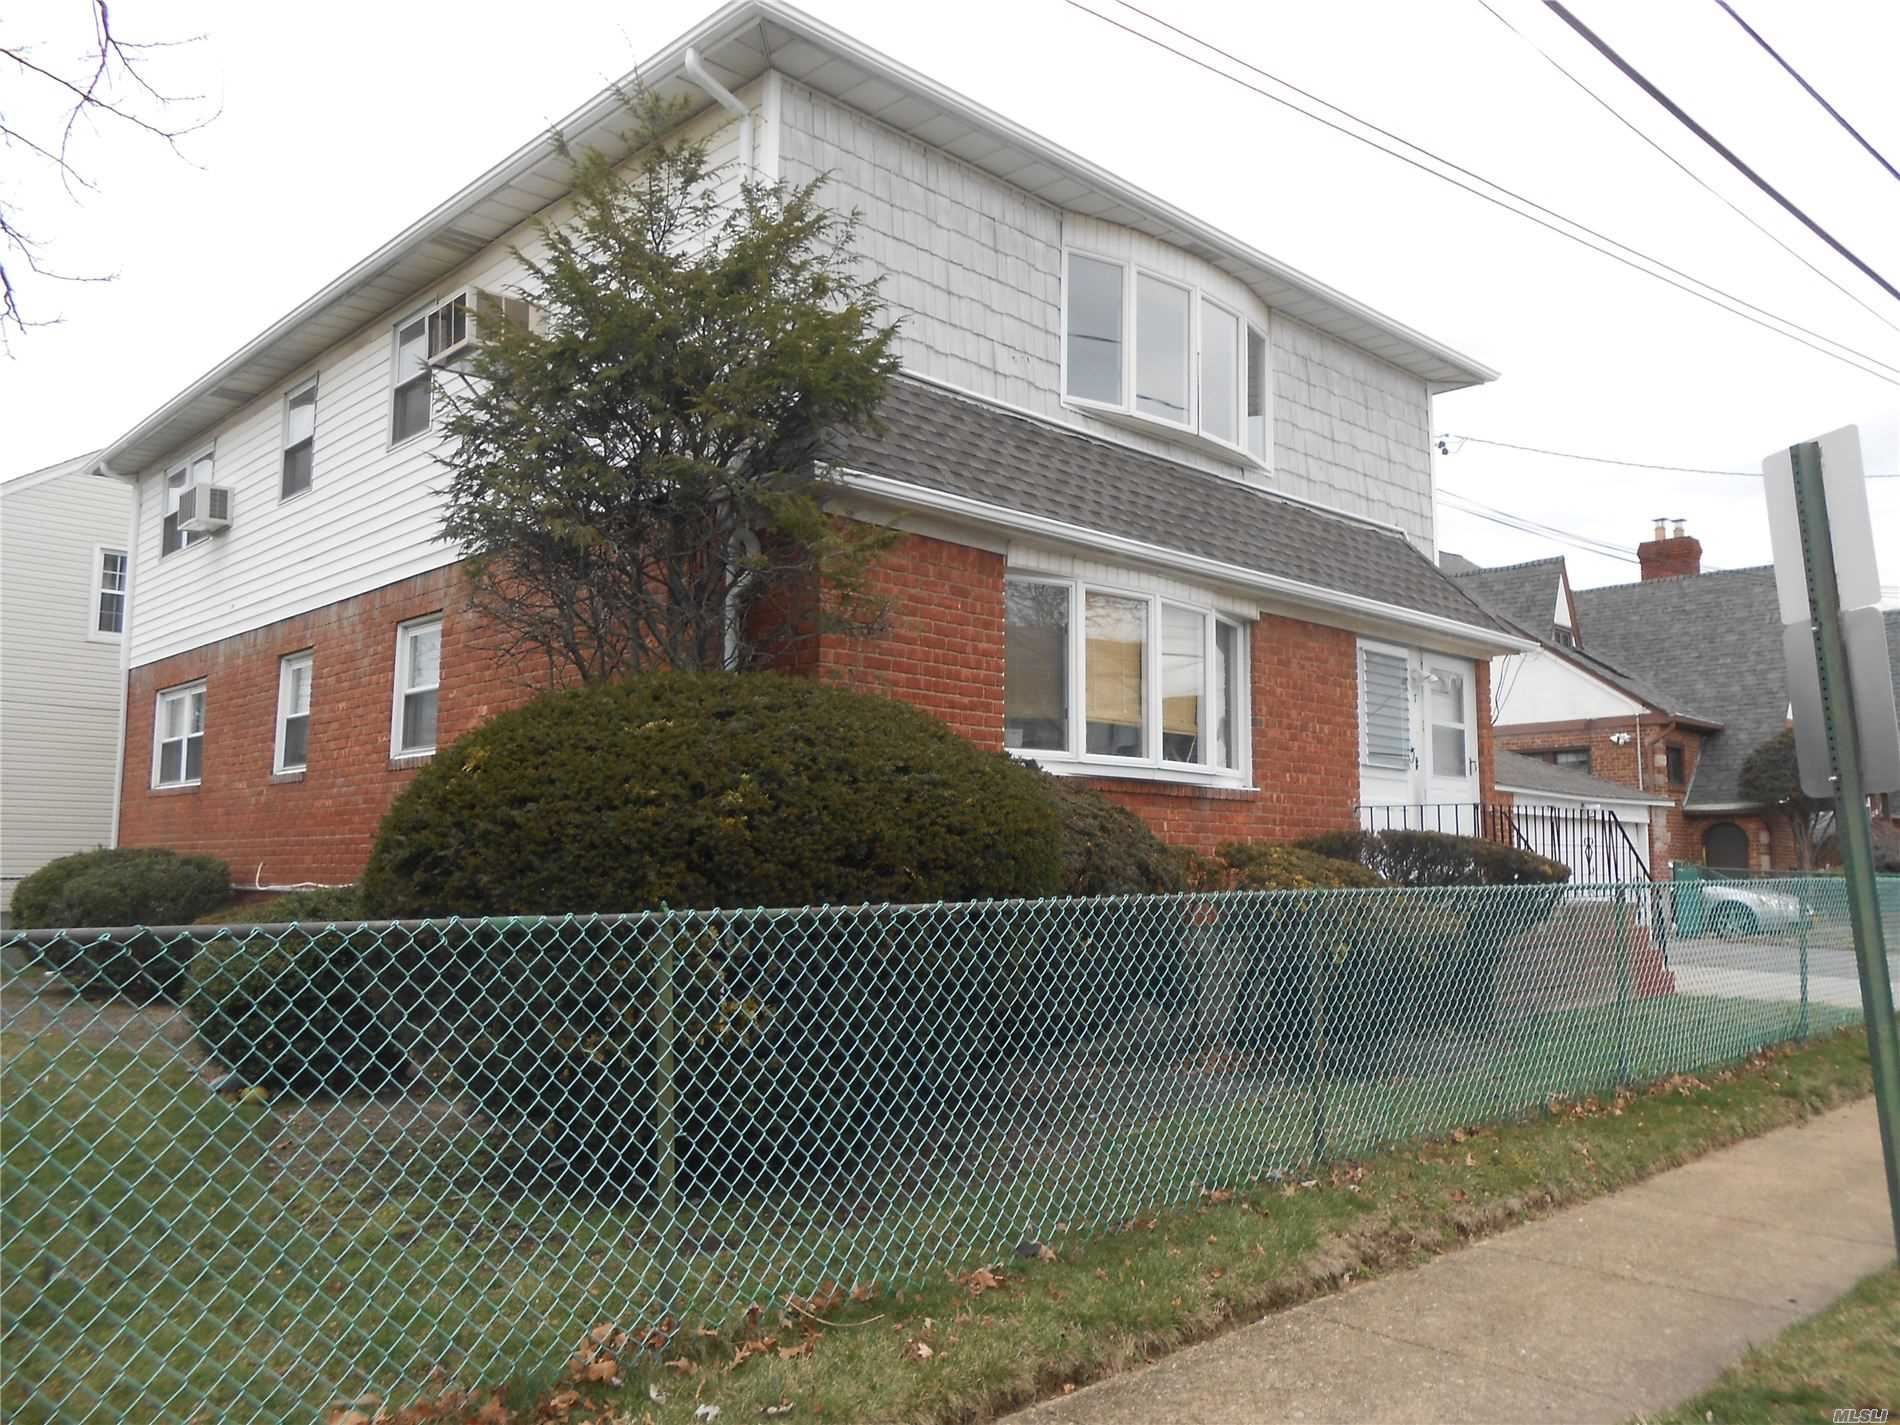 7 Evergreen Avenue #2nd fl, Lynbrook, NY 11563 - MLS#: 3213859